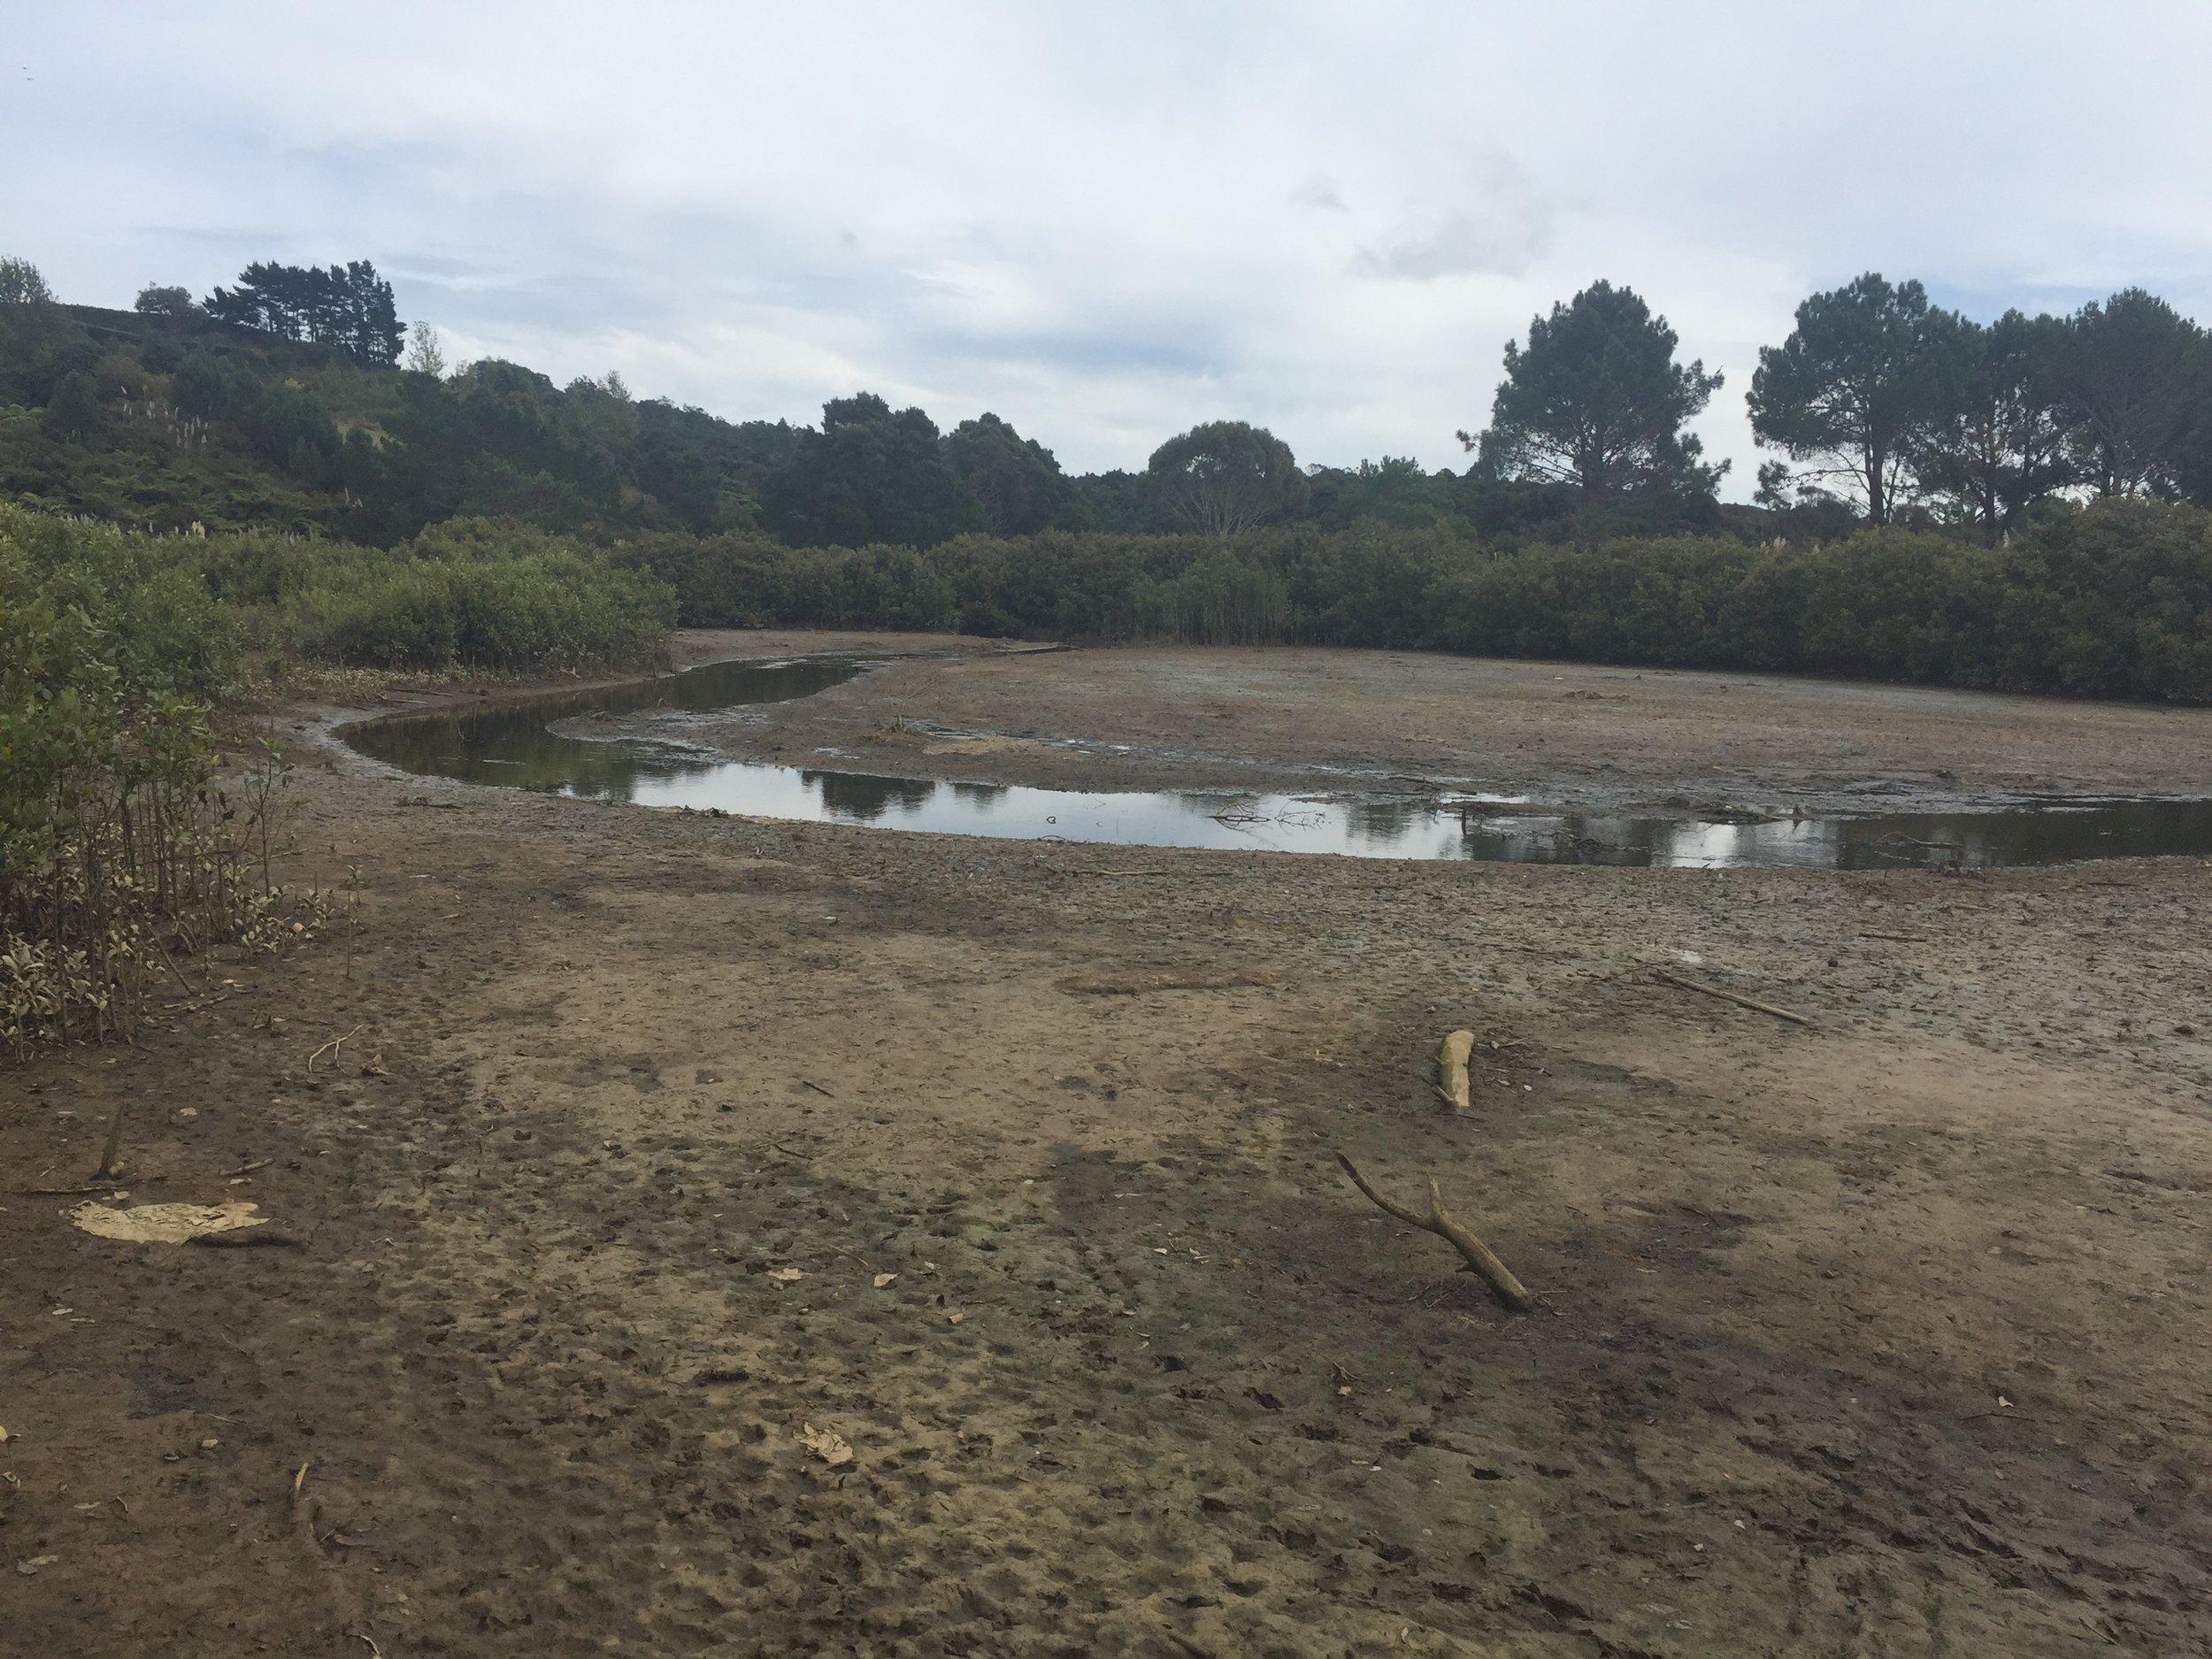 Big Bay estuarine wetland where a red seaweed is seasonally deposited with each tide.